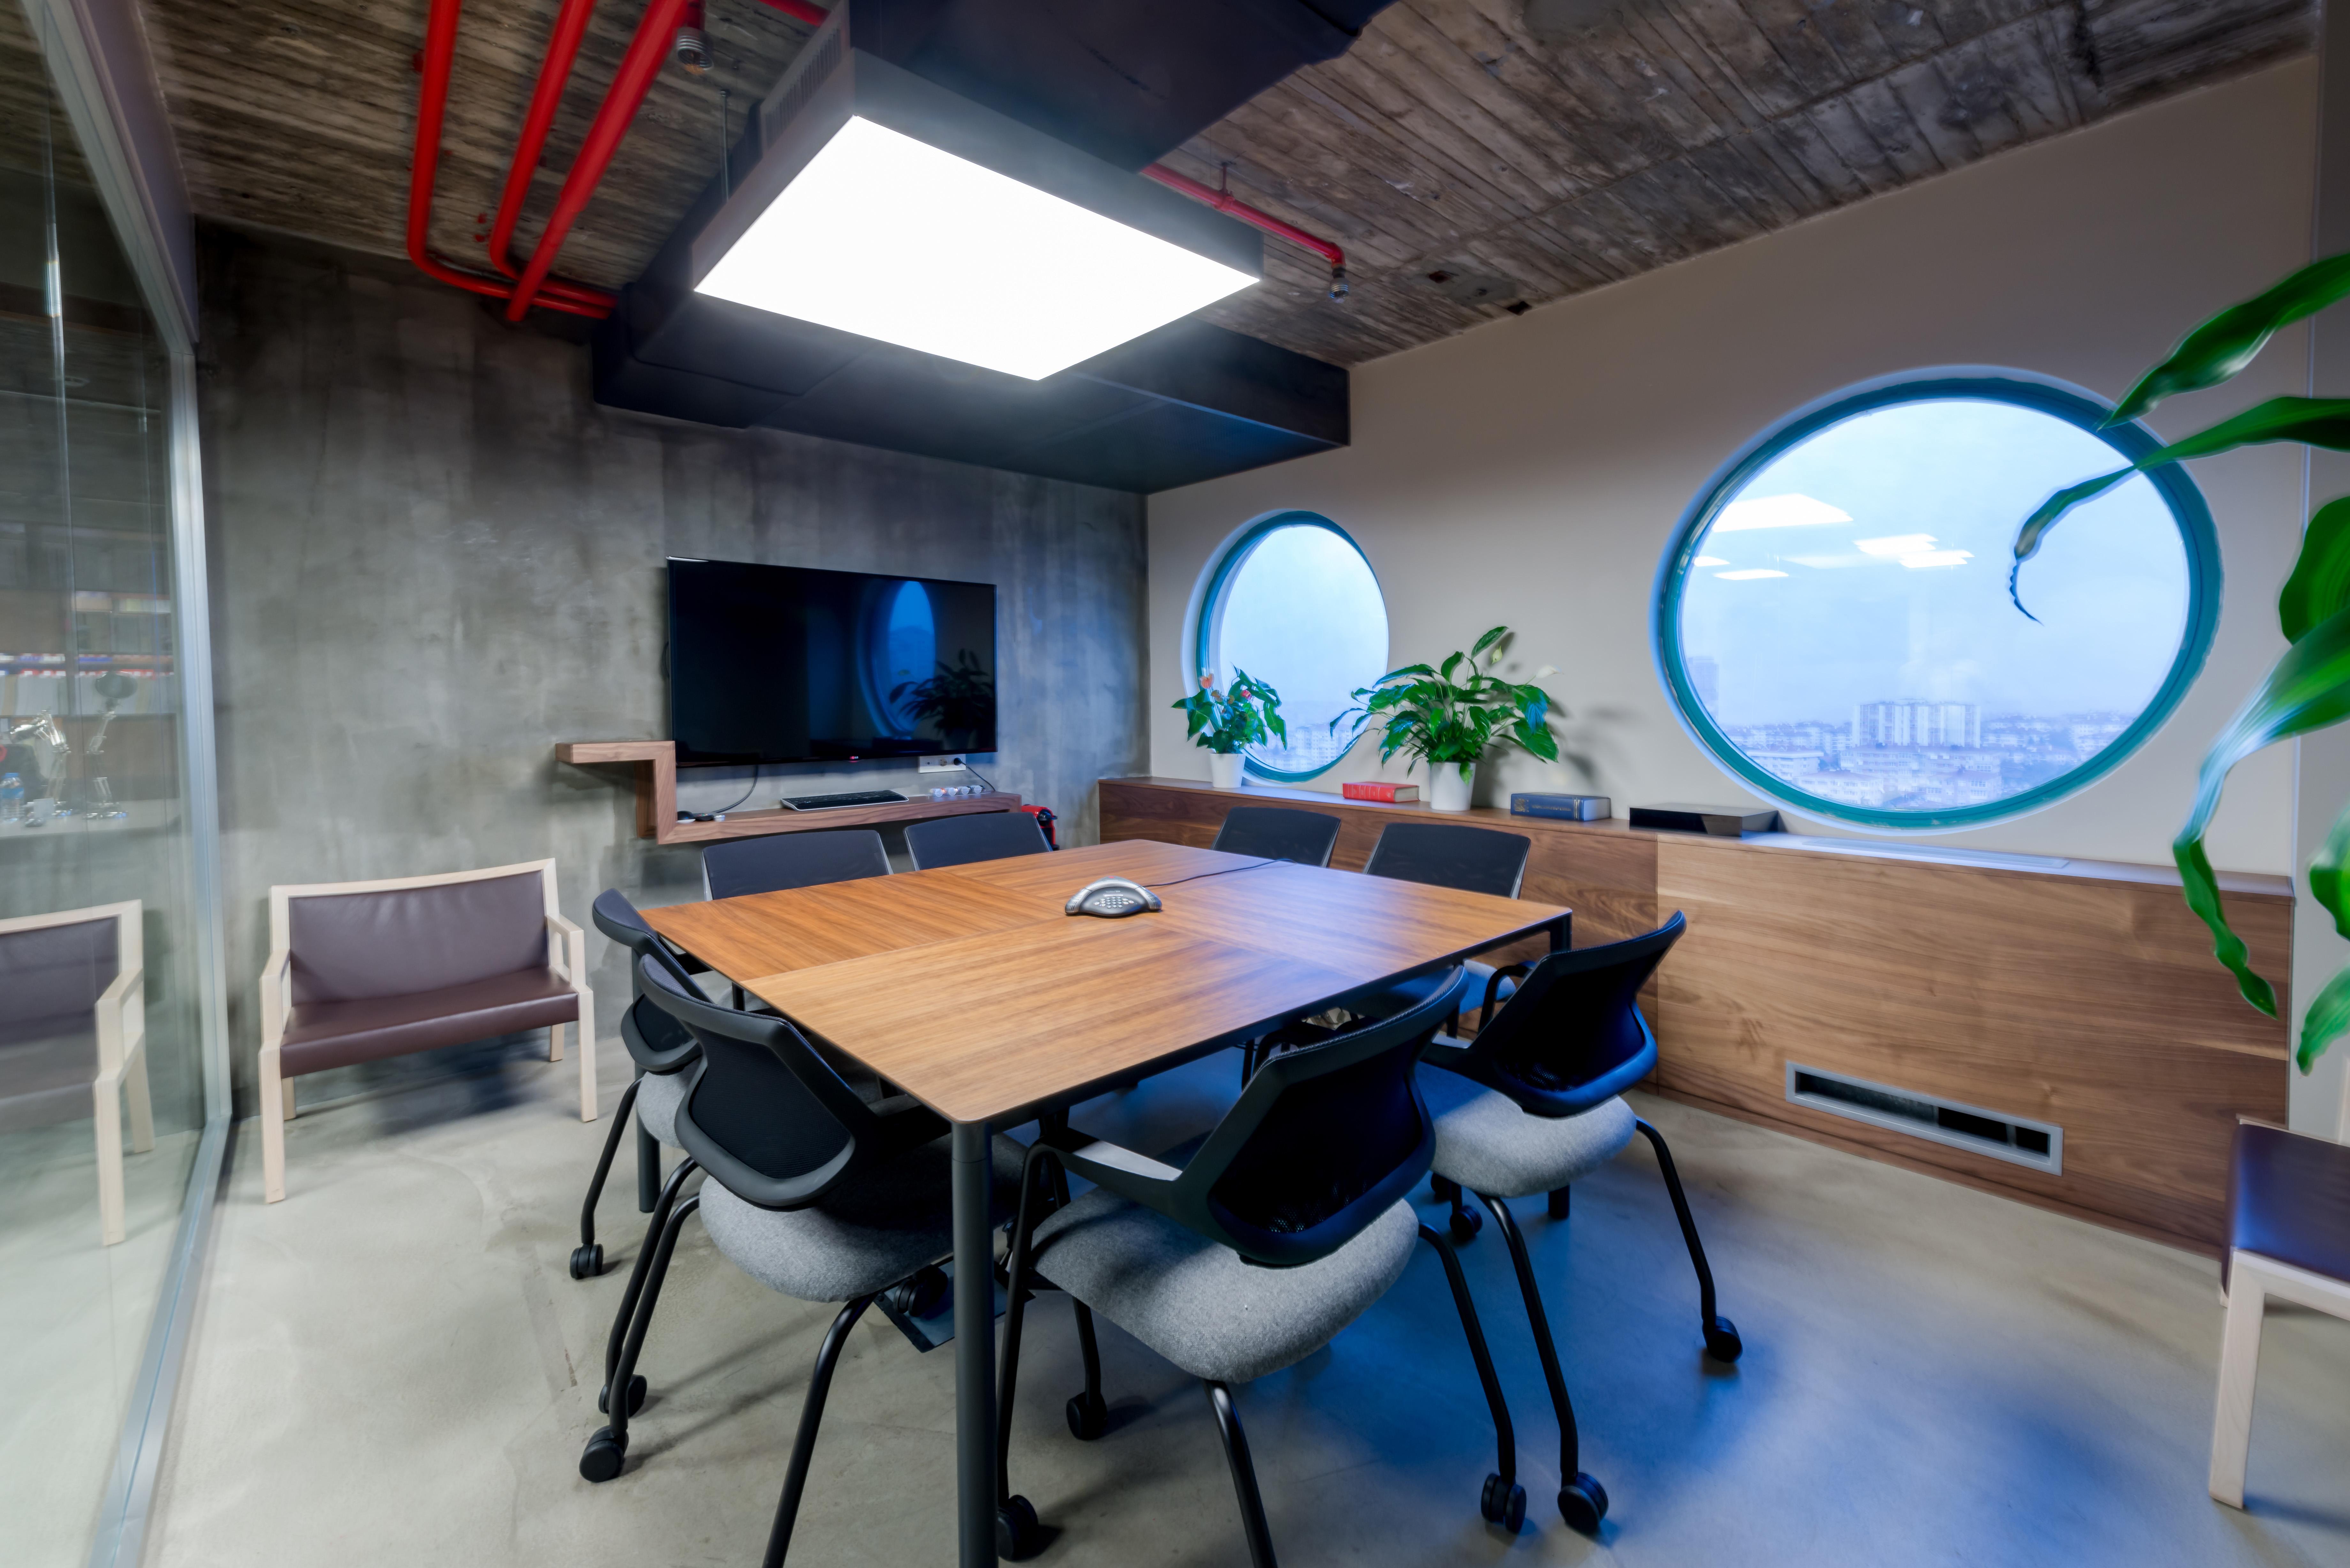 Dila+Gokalp+Architects+-+PAE+Law+Office+-+Kucuk+Toplanti+Odasi++